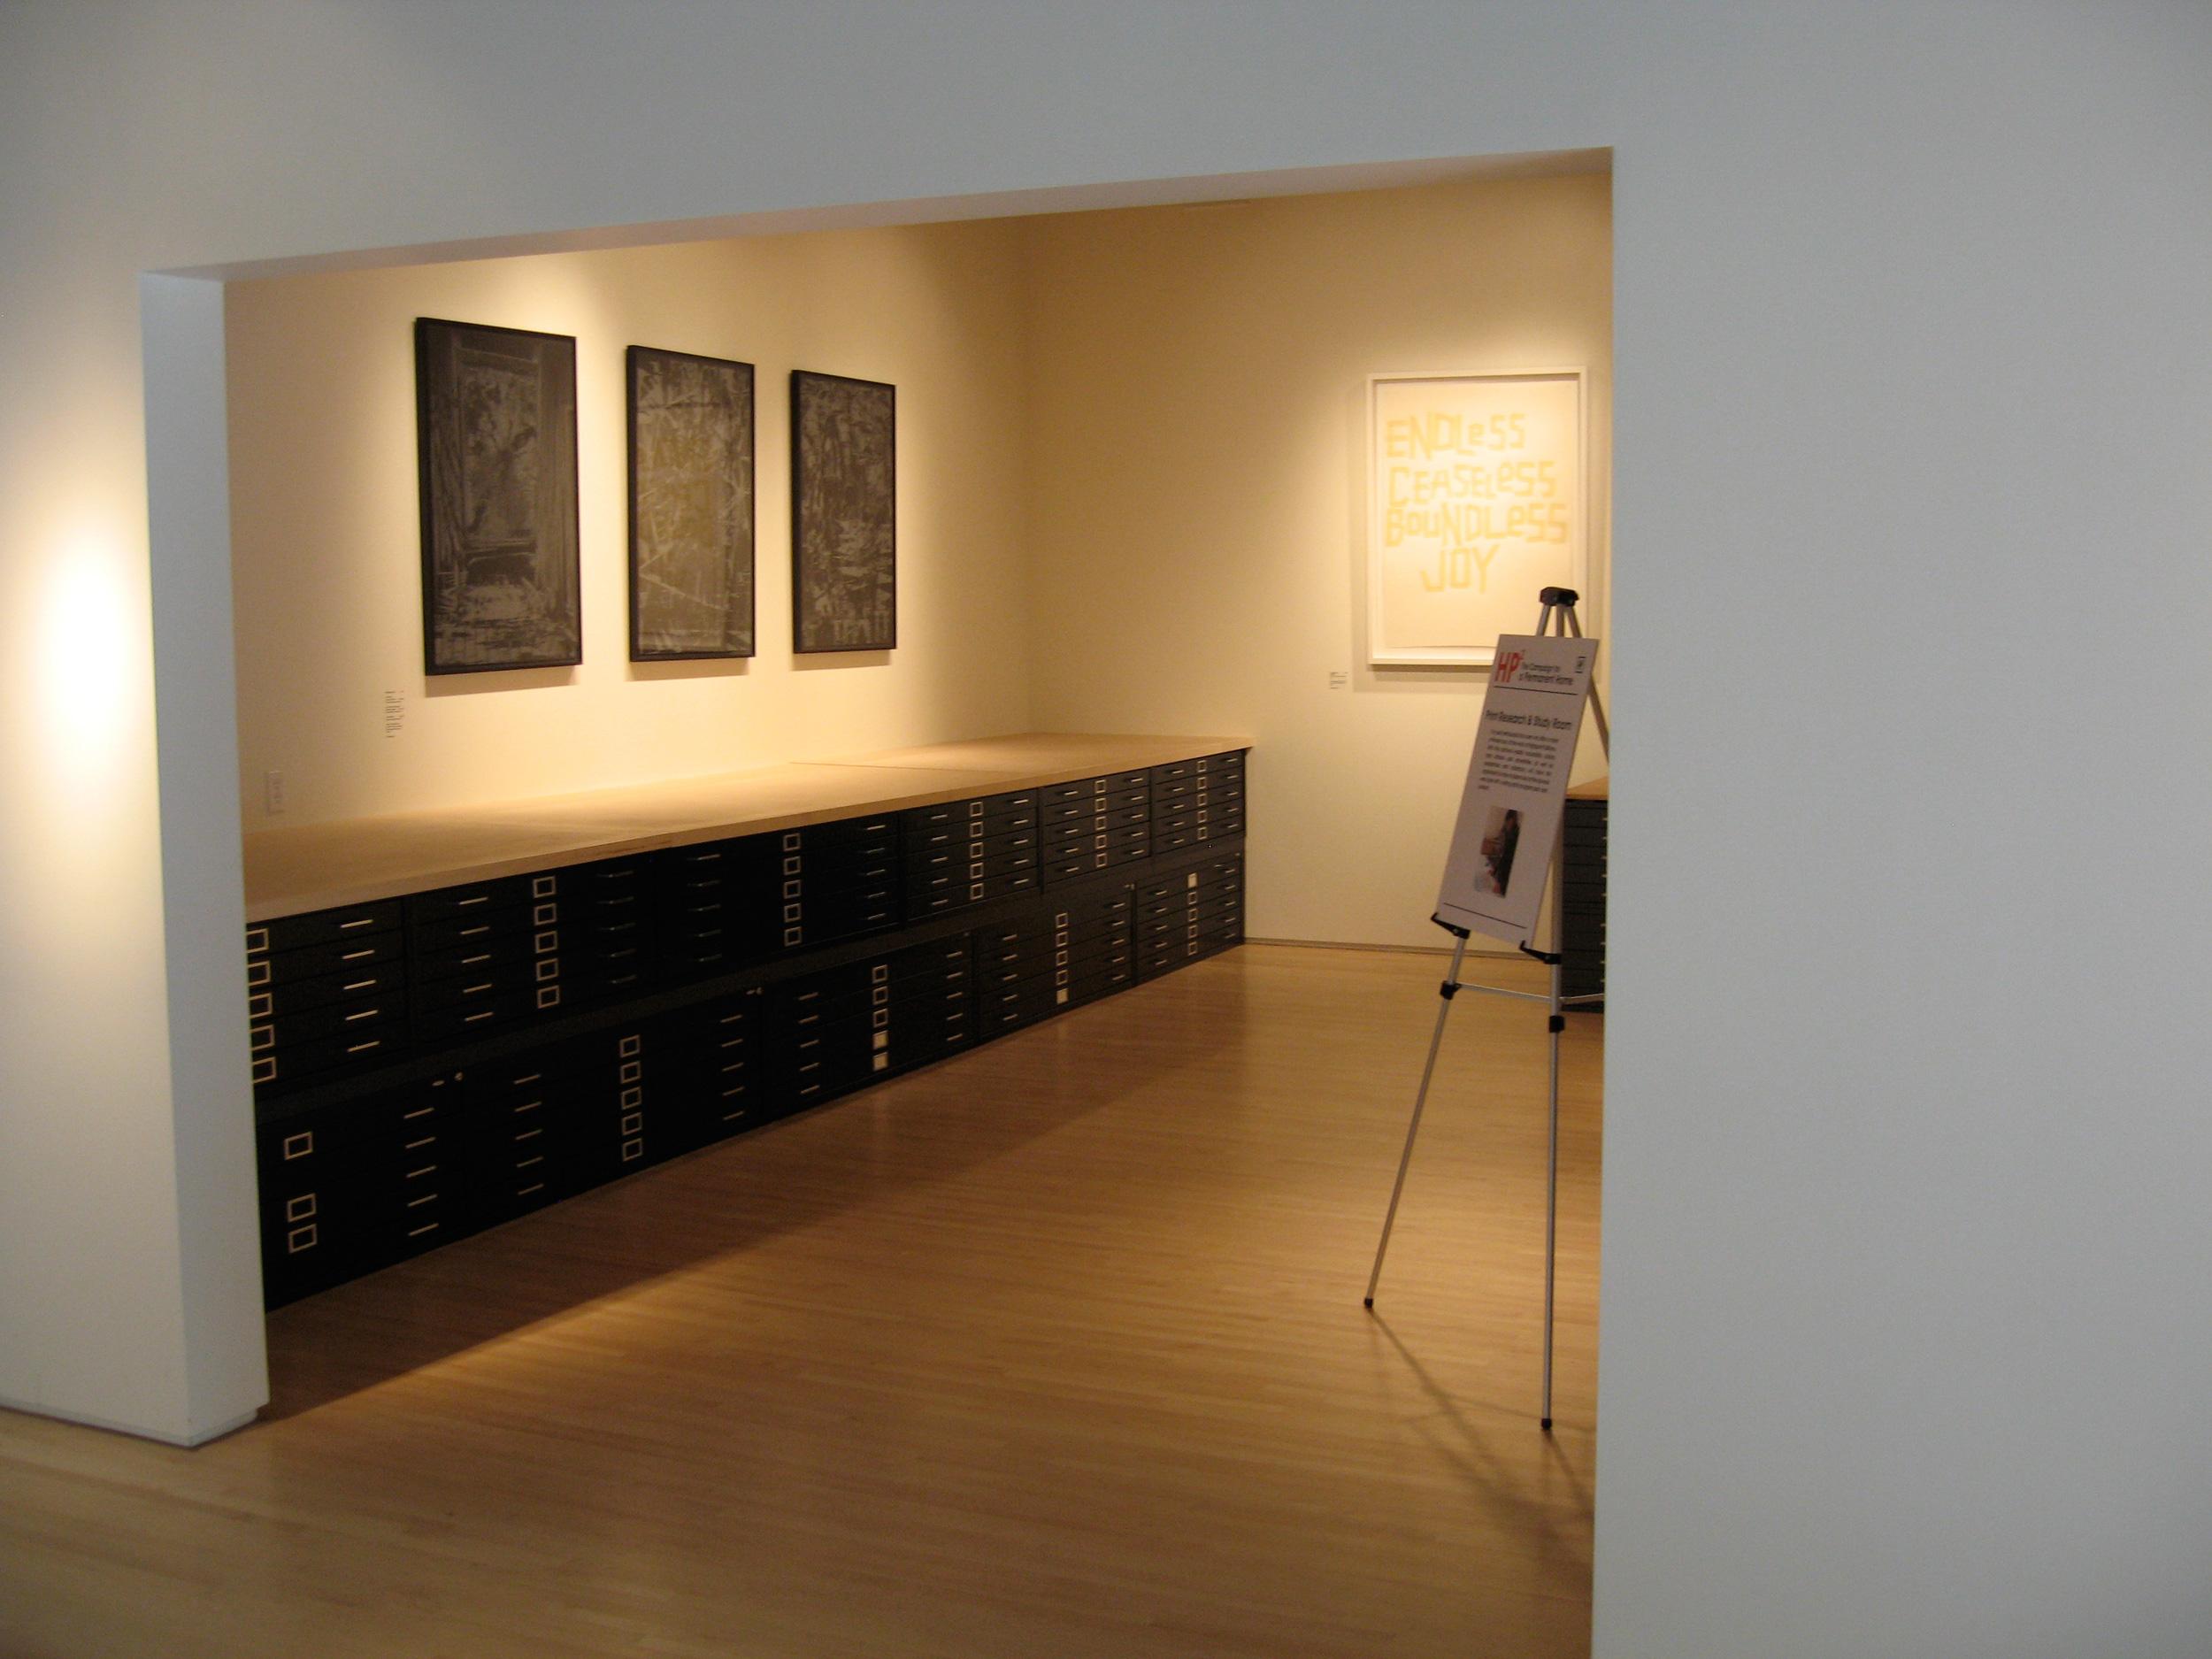 Print Study Room